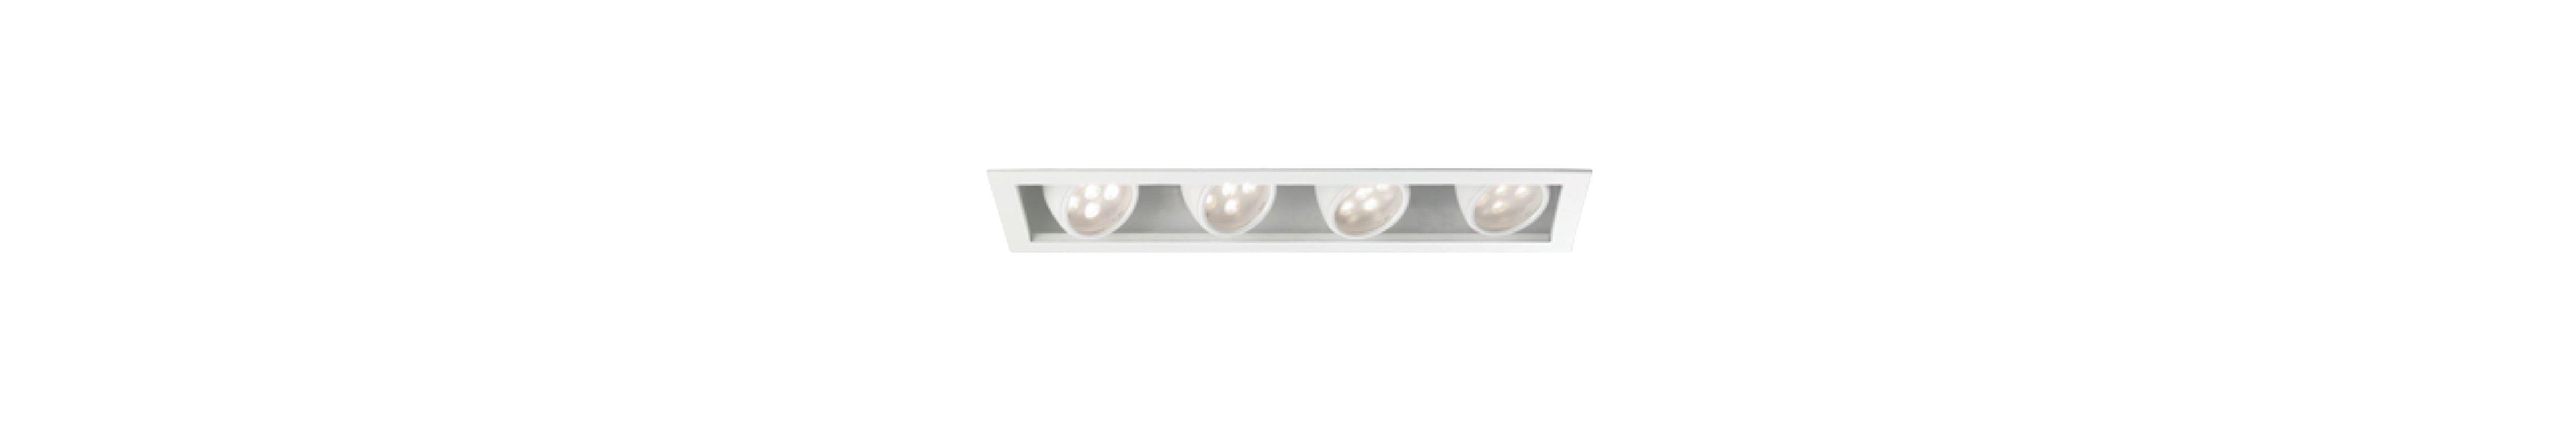 WAC Lighting MT-LED418F-CWHS Multiple Spot 4500K High Output LED